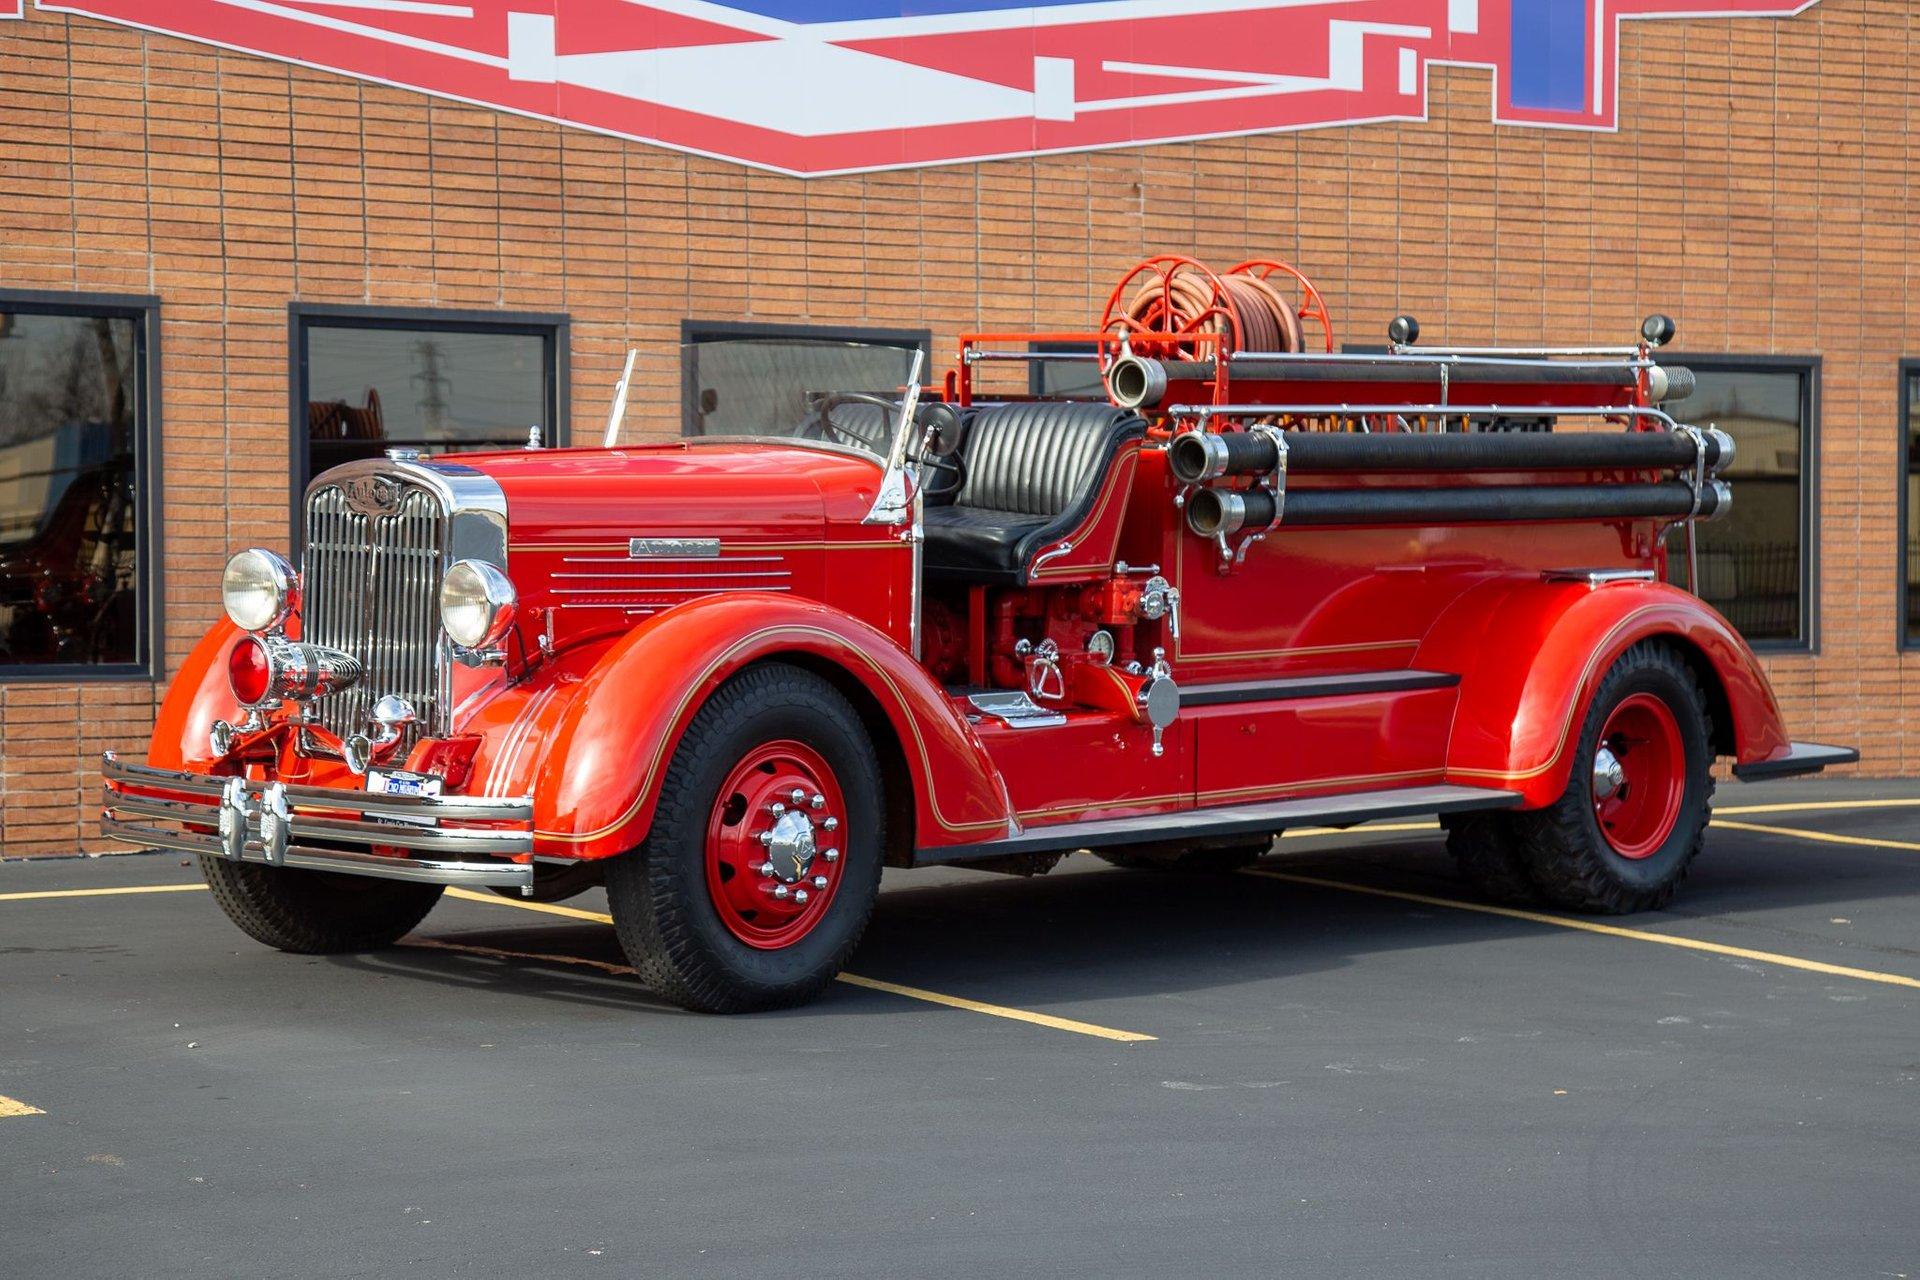 1937 autocar pumper firetruck